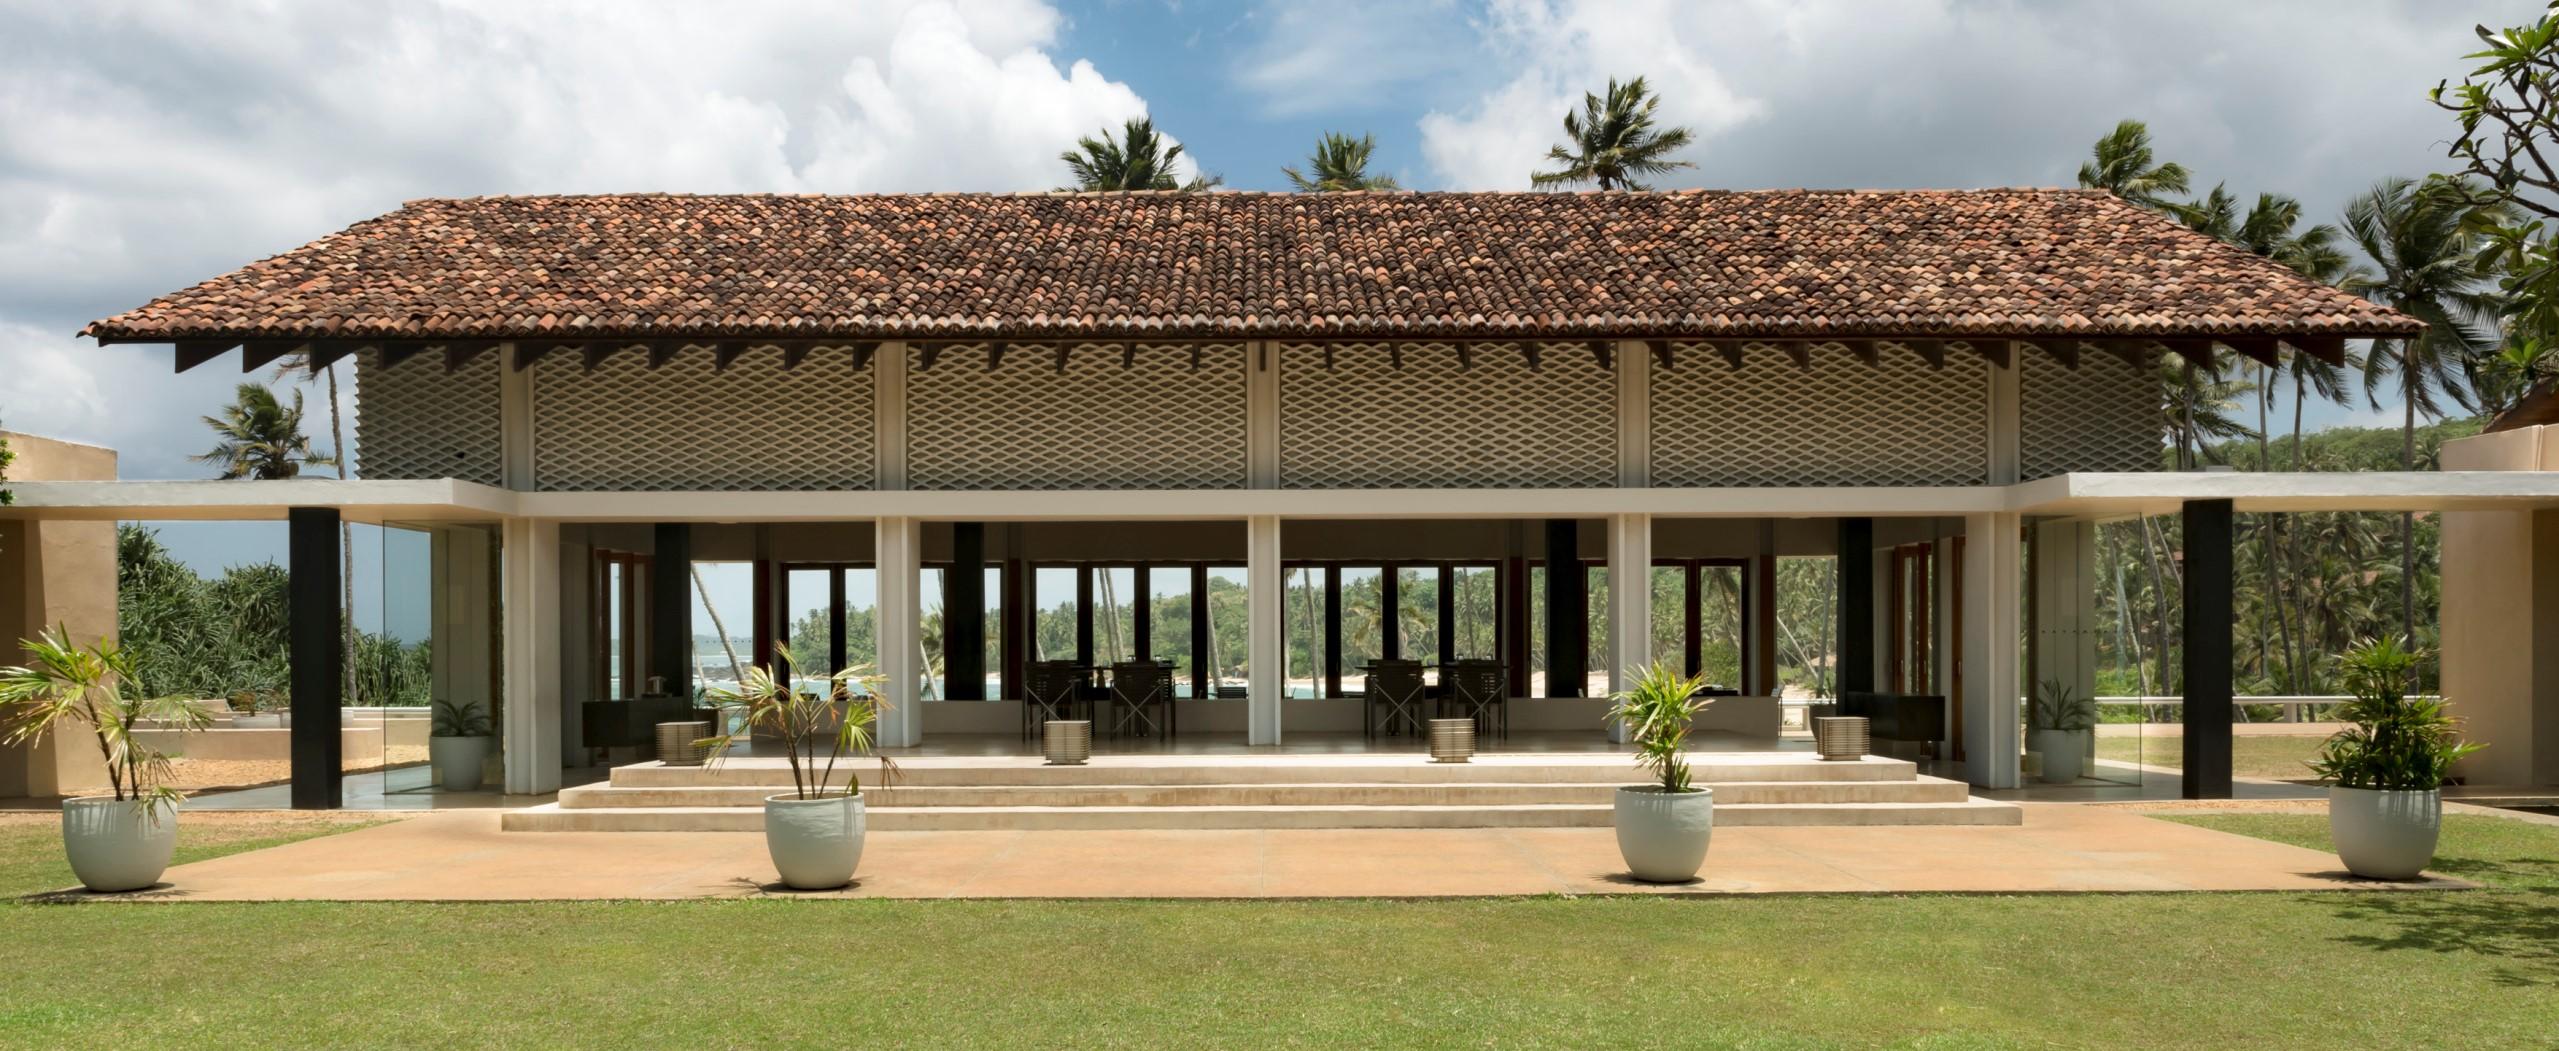 Amanwella-Sri-Lanka-Restaurant-exterior.